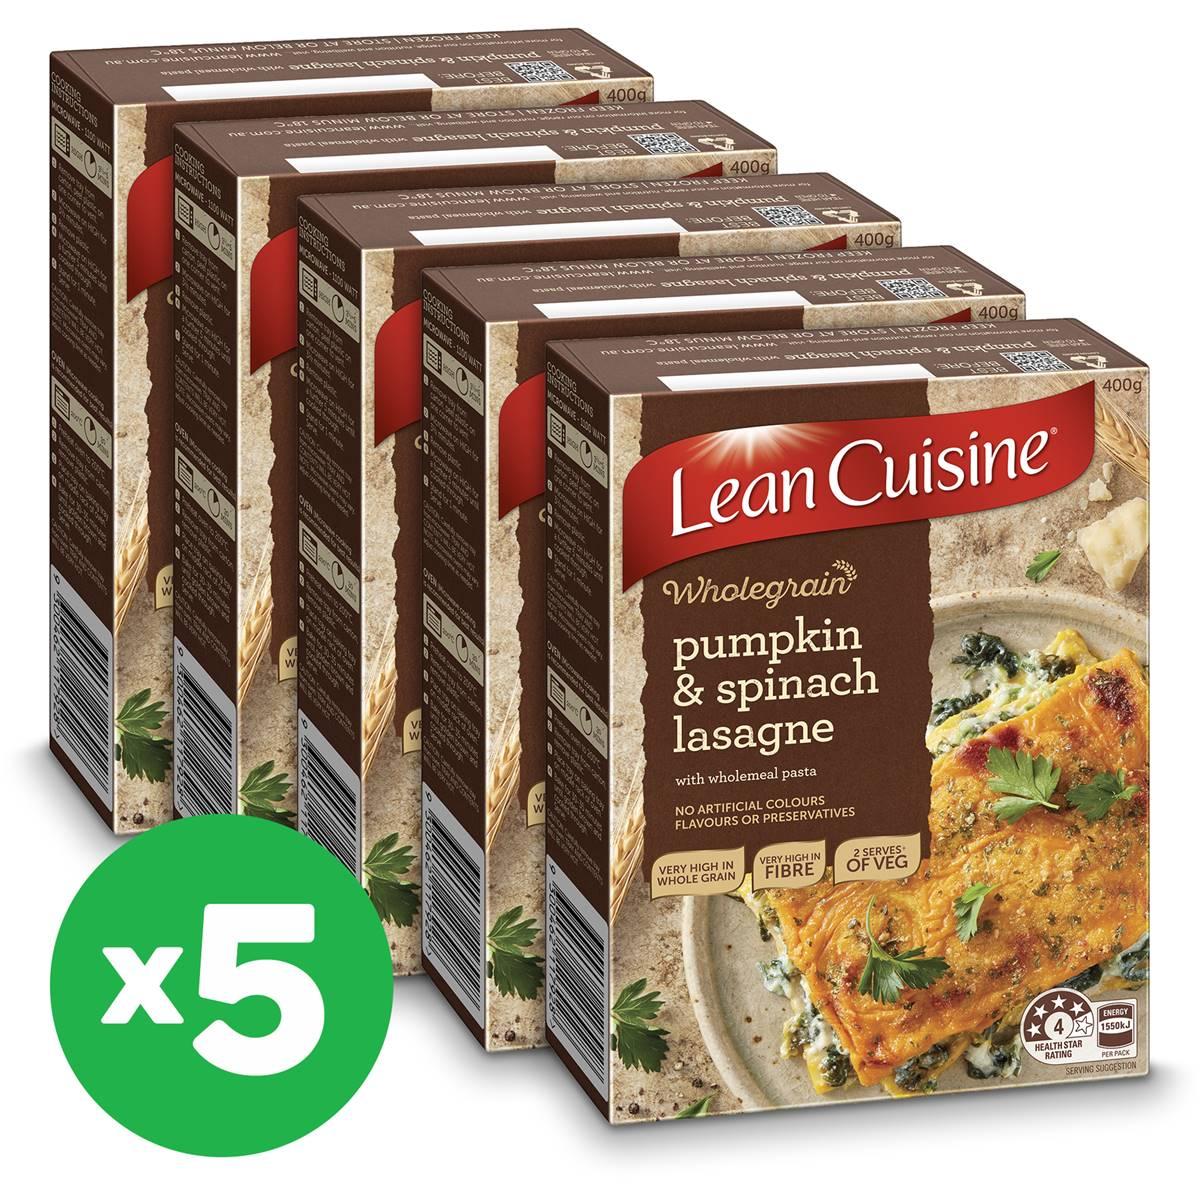 Lean cuisine wholegrain pumpkin spinach lasagne 400g x5 for Average price of lean cuisine